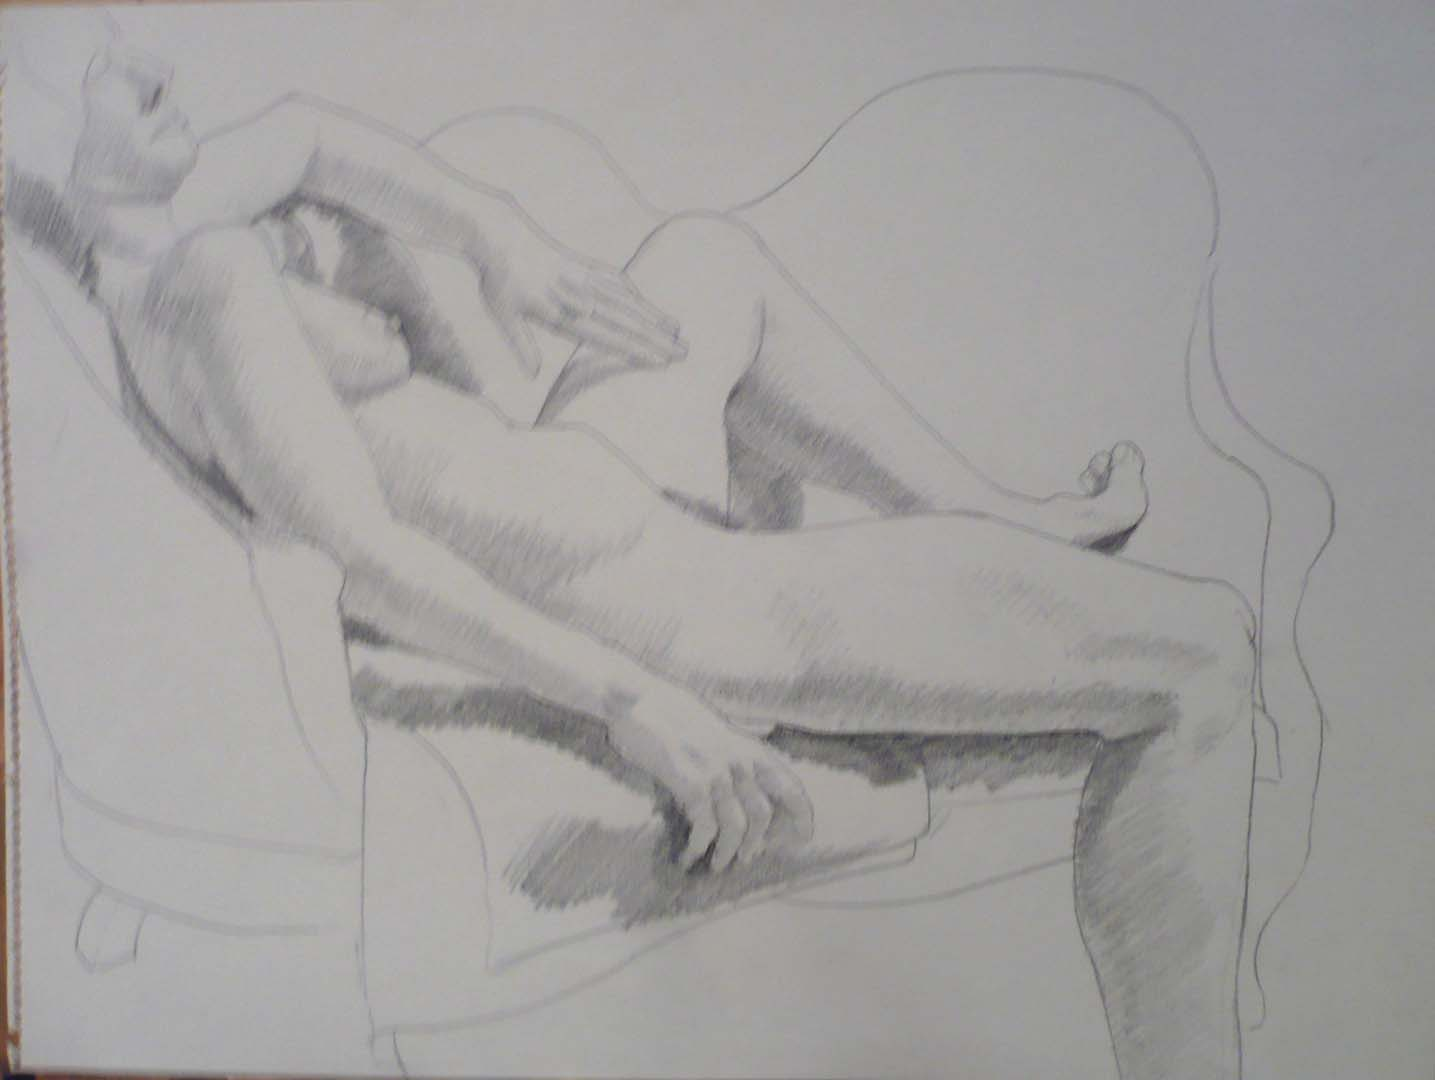 Female Model Reclining on Sofa Pencil 17.875 x 23.625